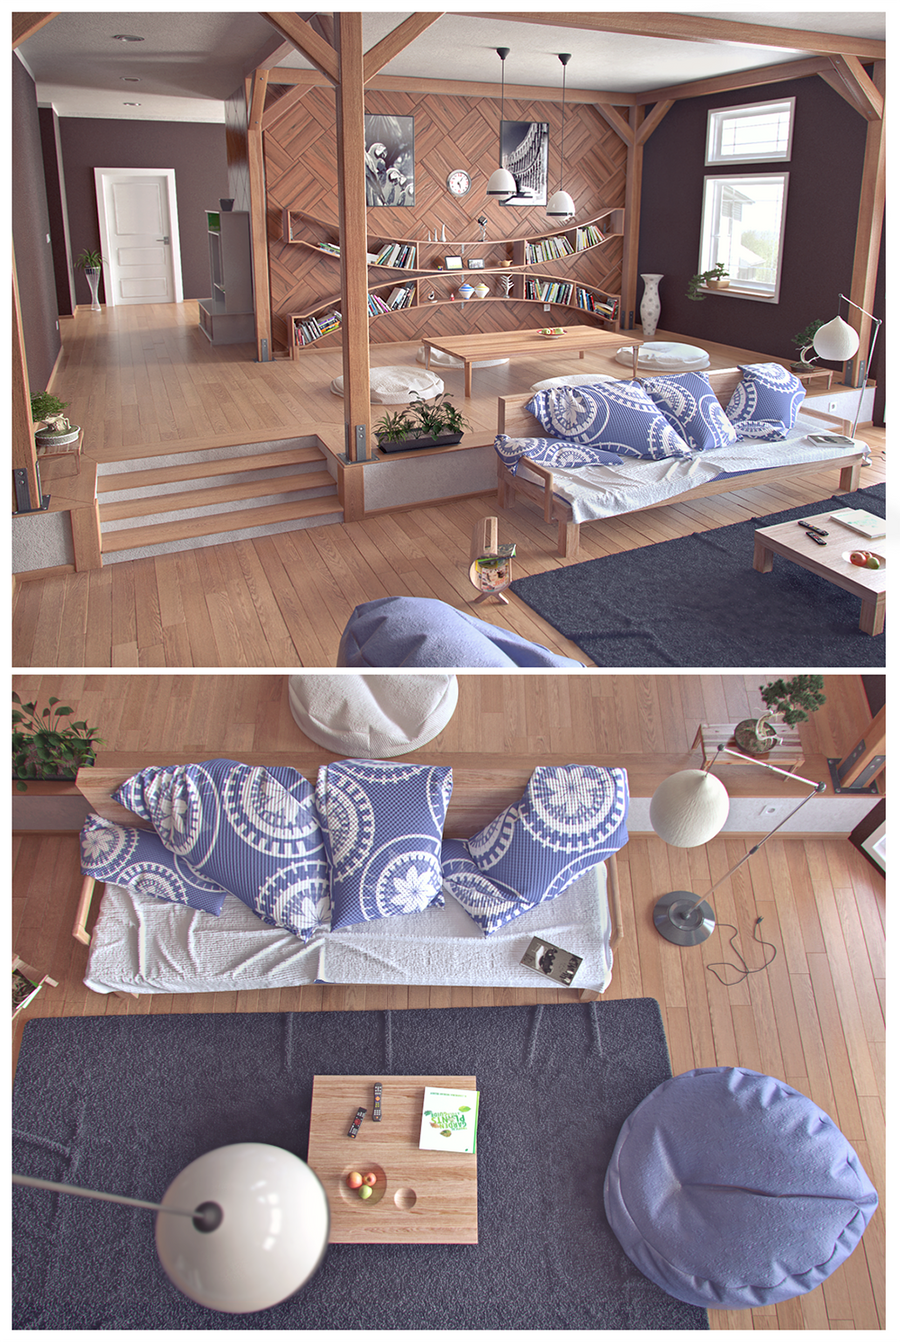 Interior_living room by Klaudio2U